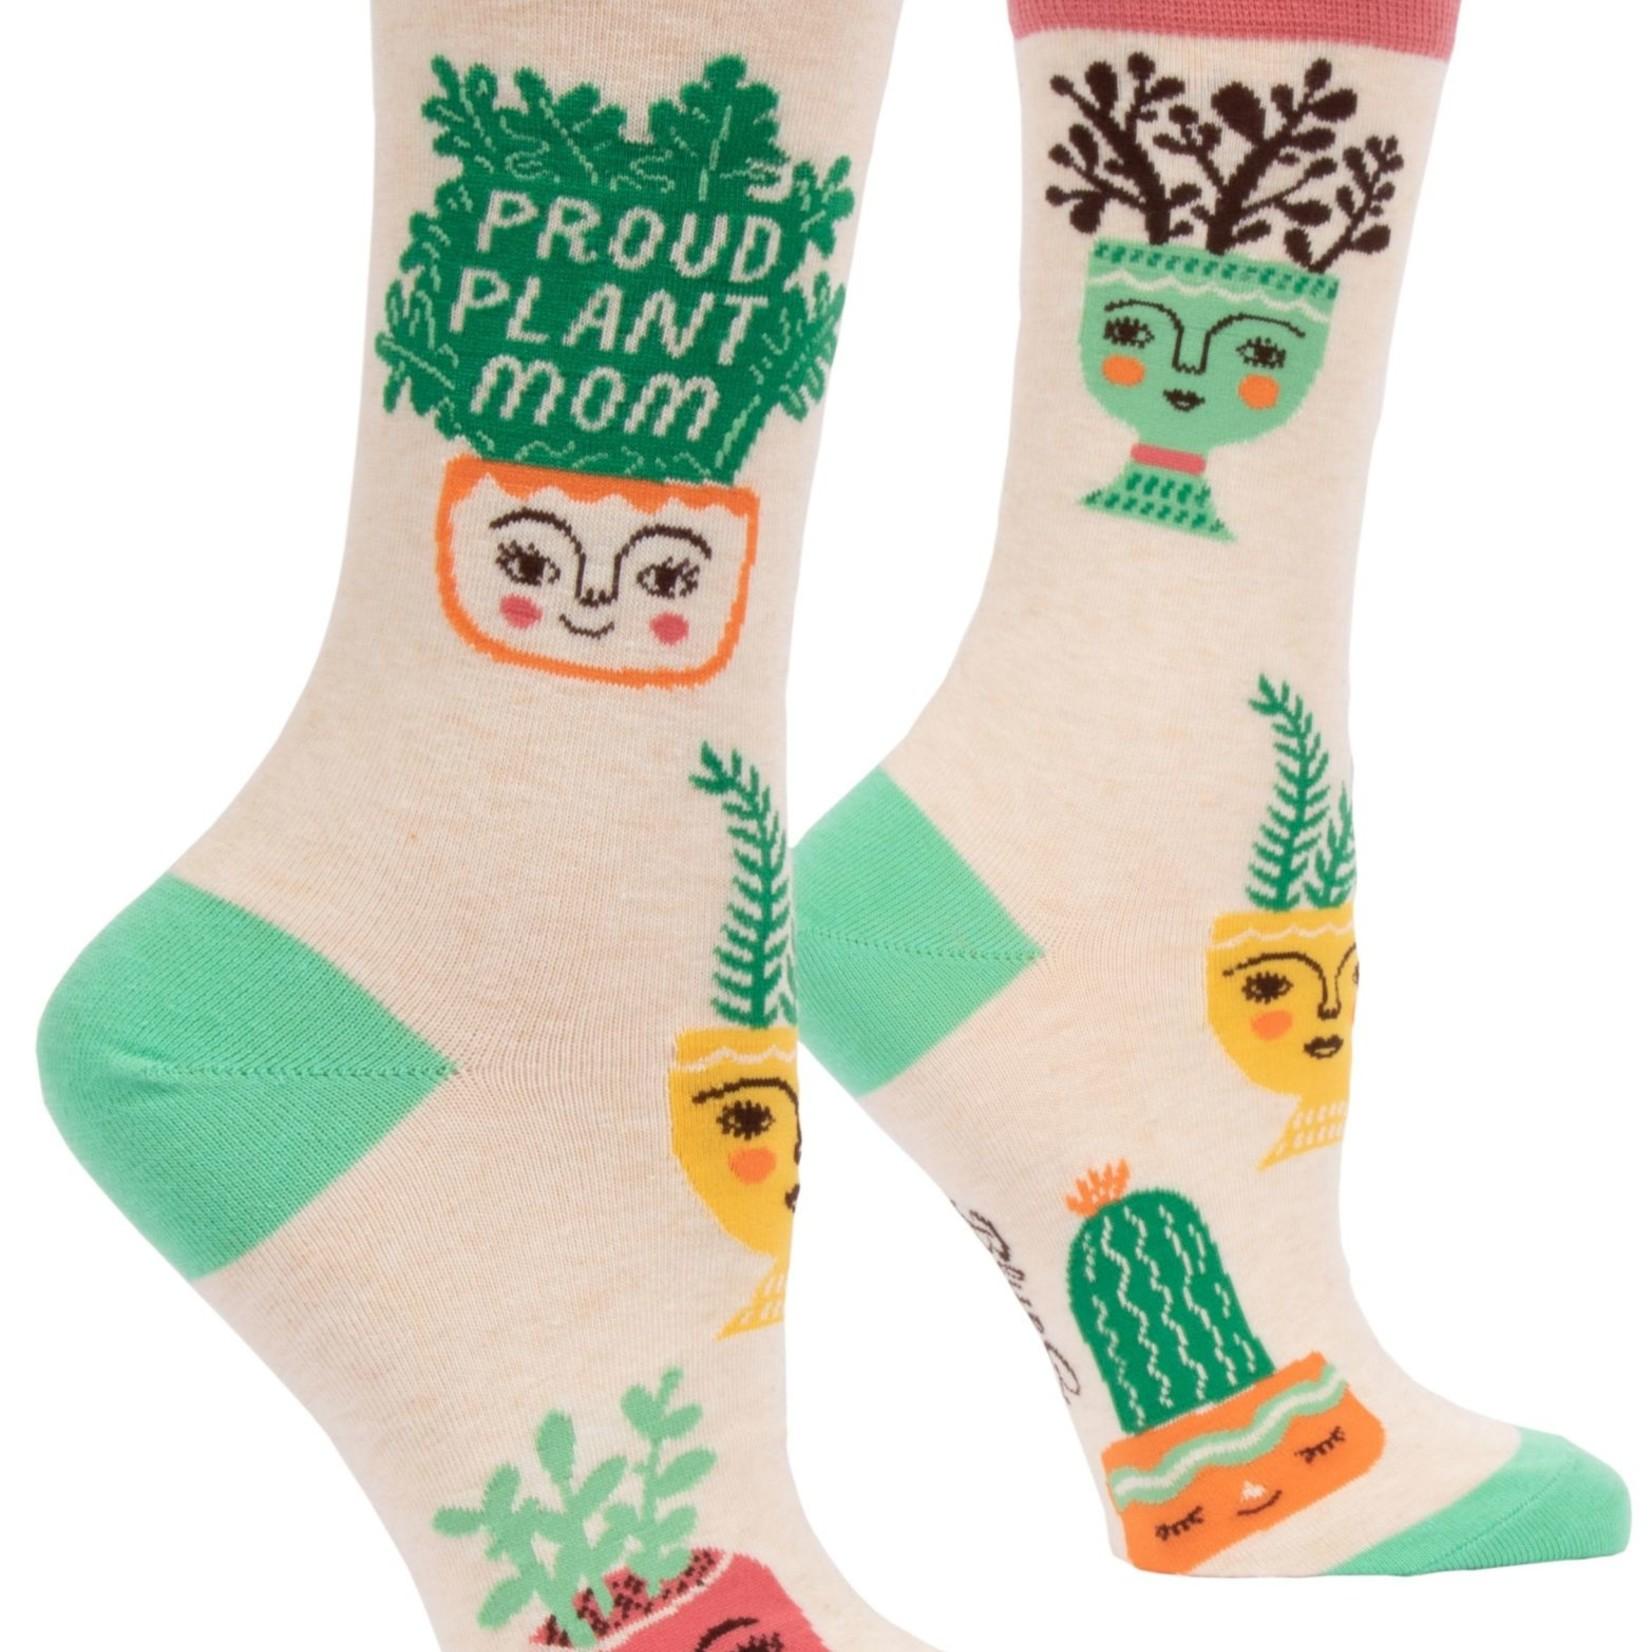 Proud Plant Mom Women's Crew Socks